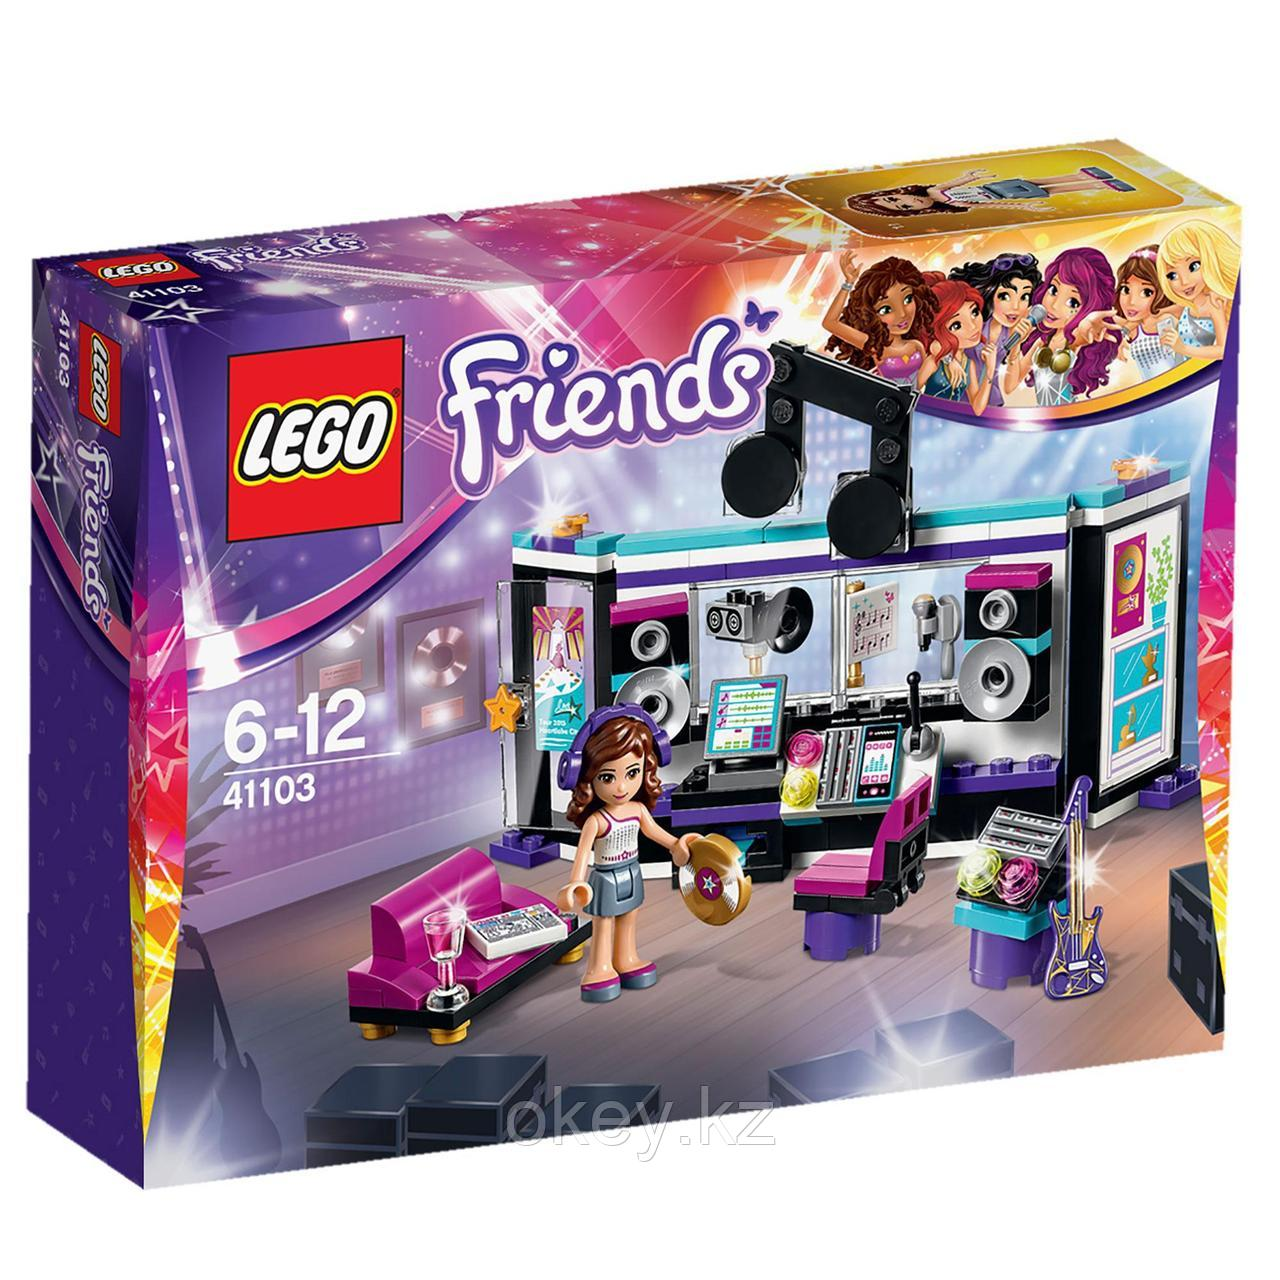 LEGO Friends: Поп звезда: Студия звукозаписи 41103